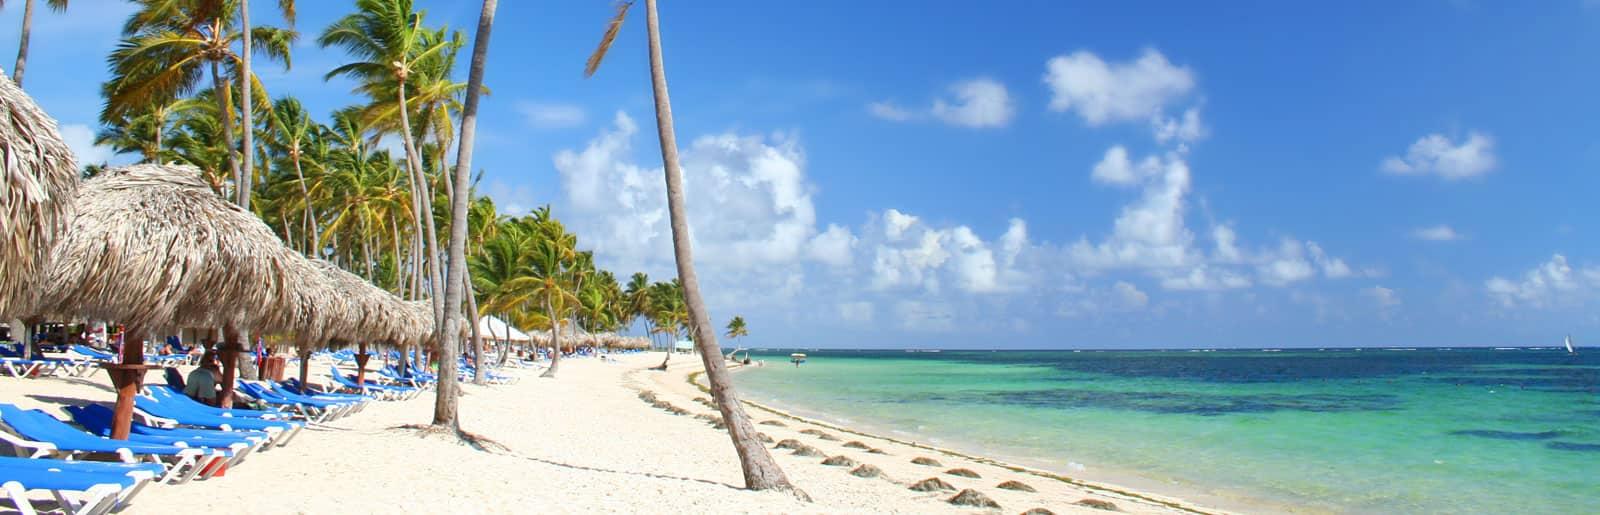 Dominica Beach Hotel